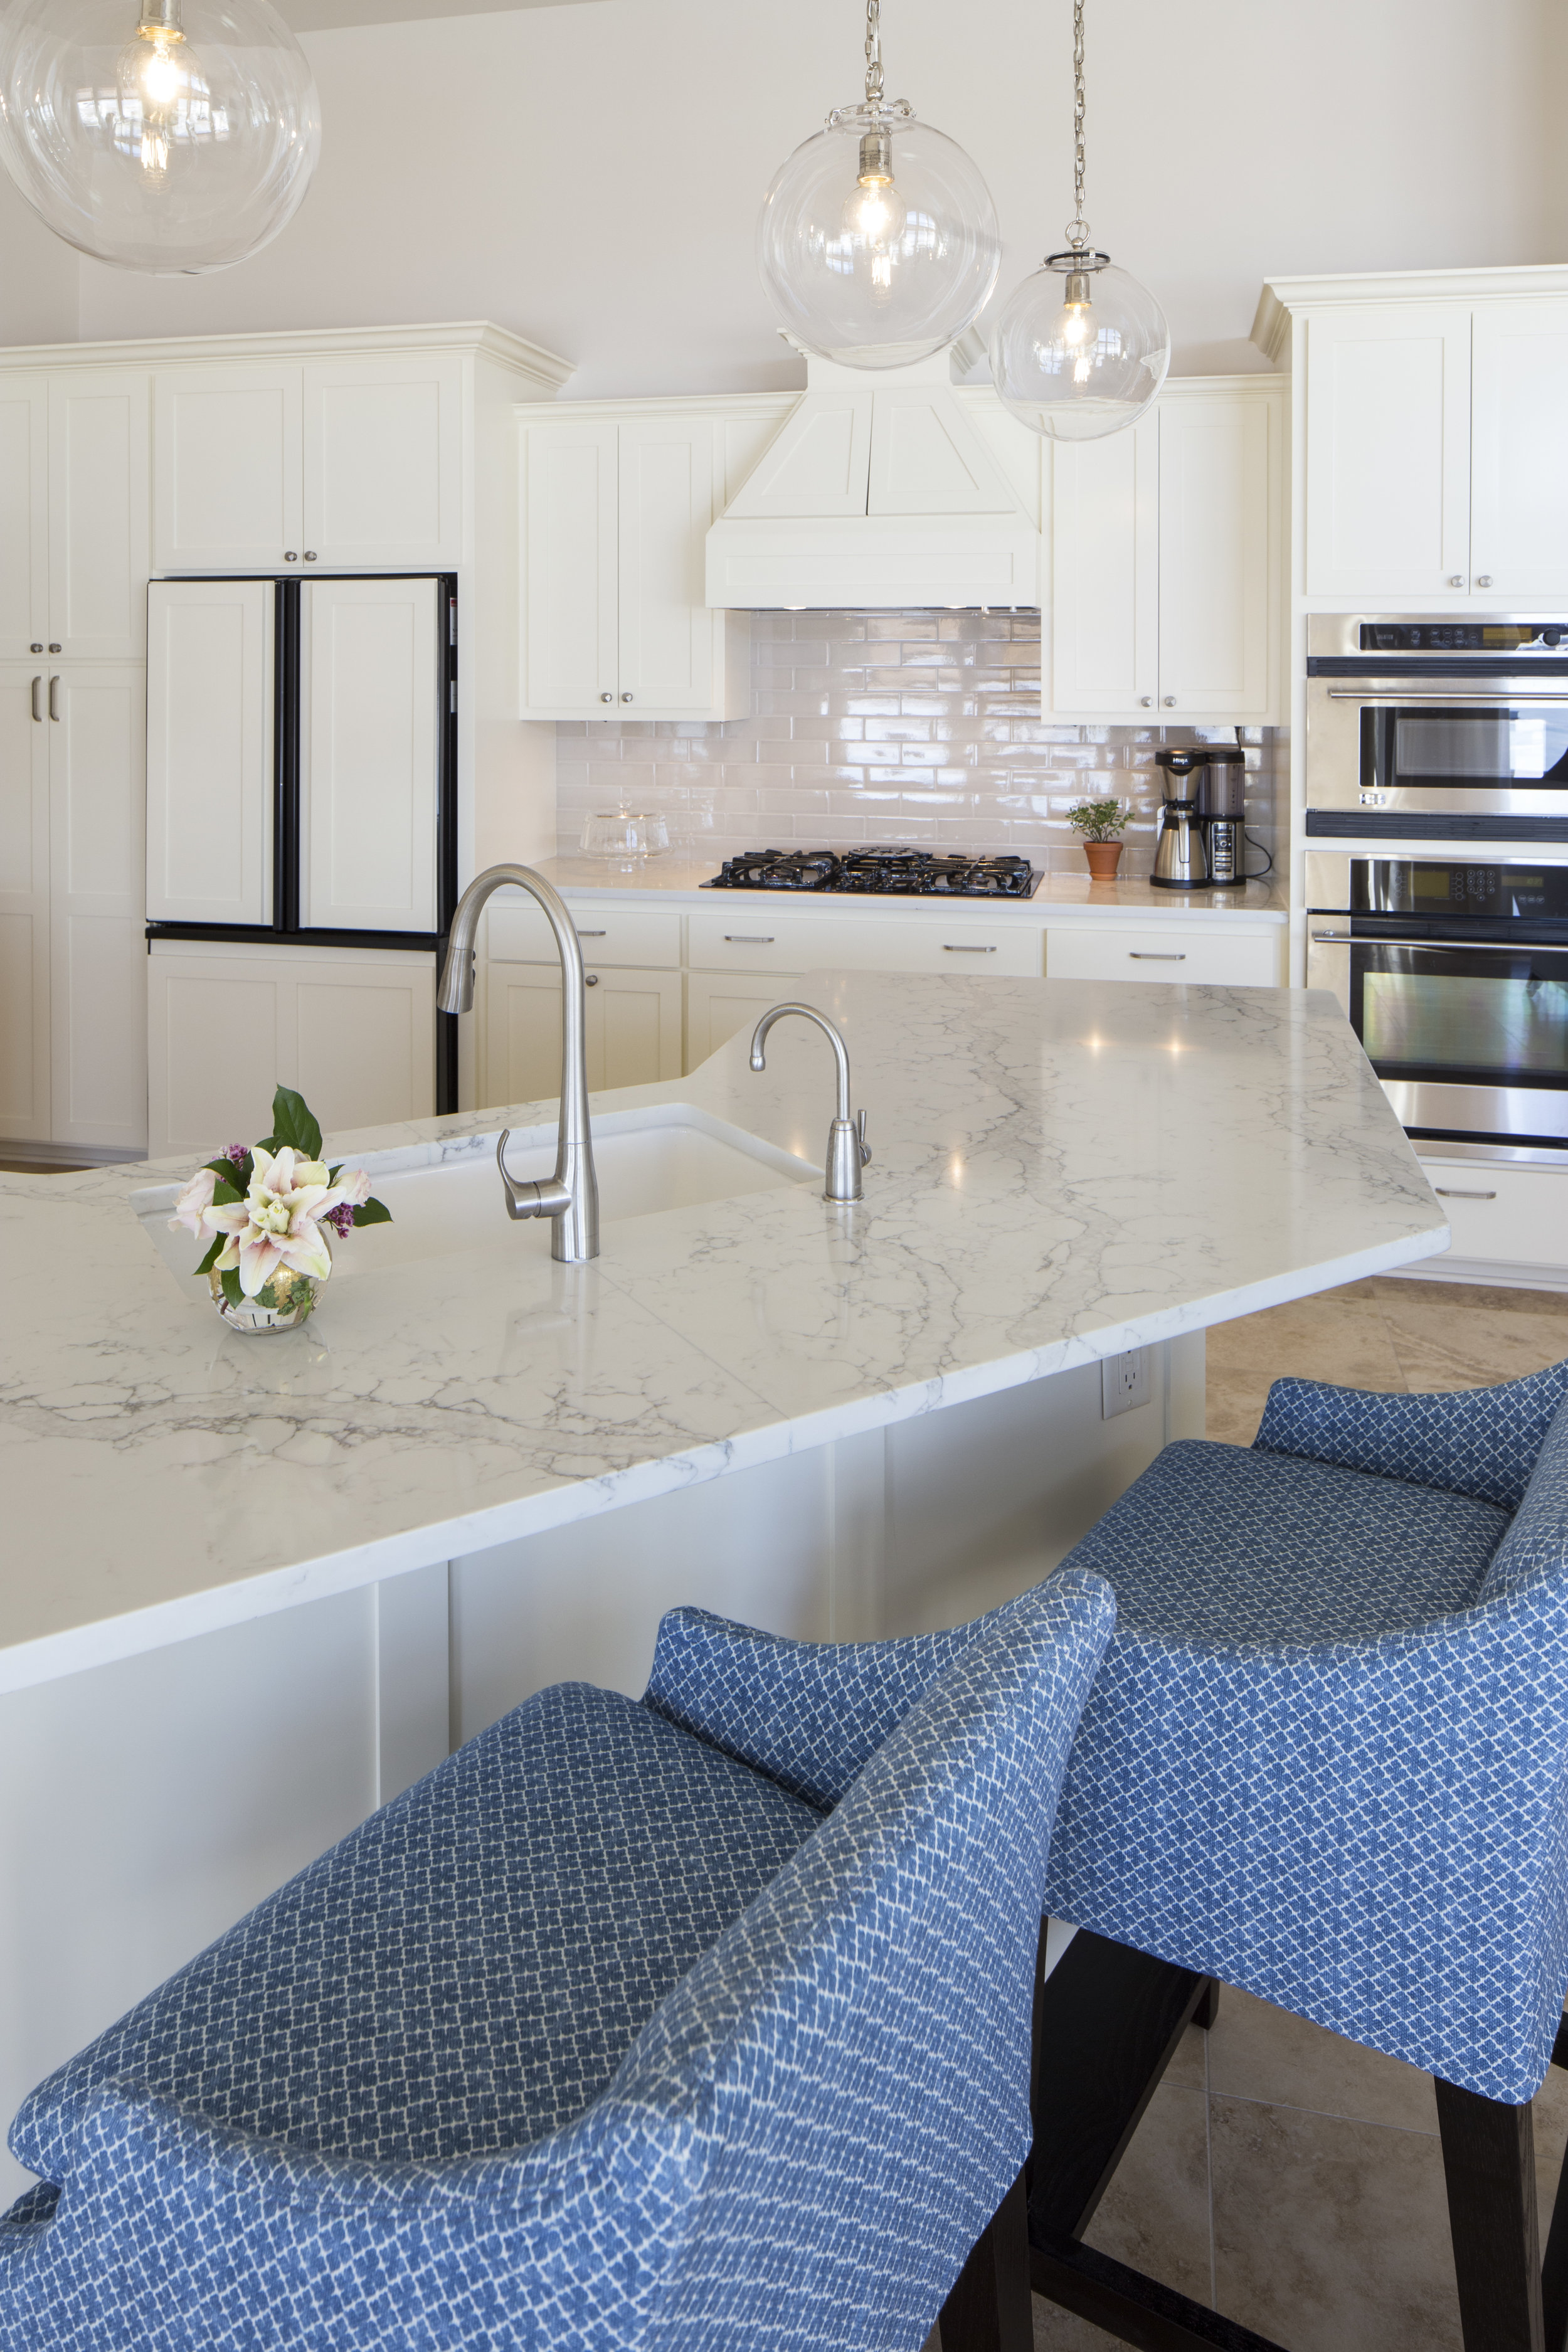 Kitchen Island Stovetop.jpg